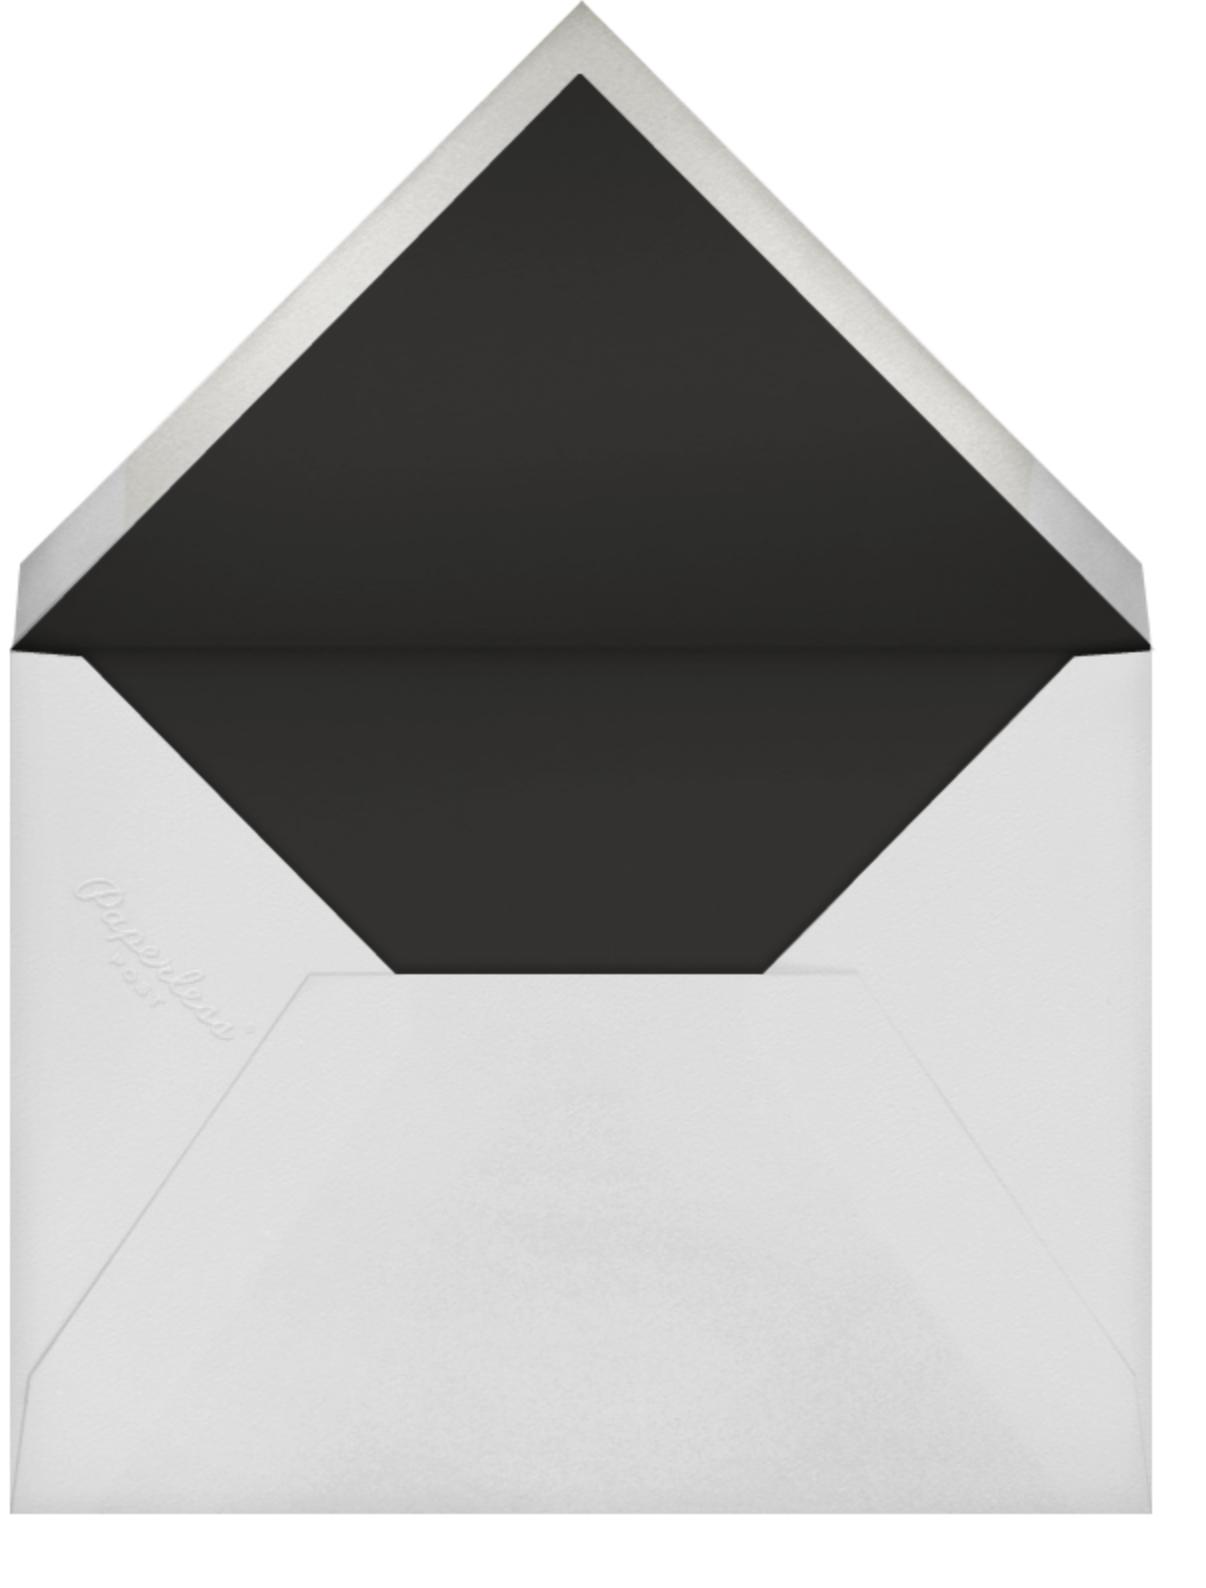 Tulip Dot (Save the Date) - Wedgewood/Silver - Oscar de la Renta - Envelope